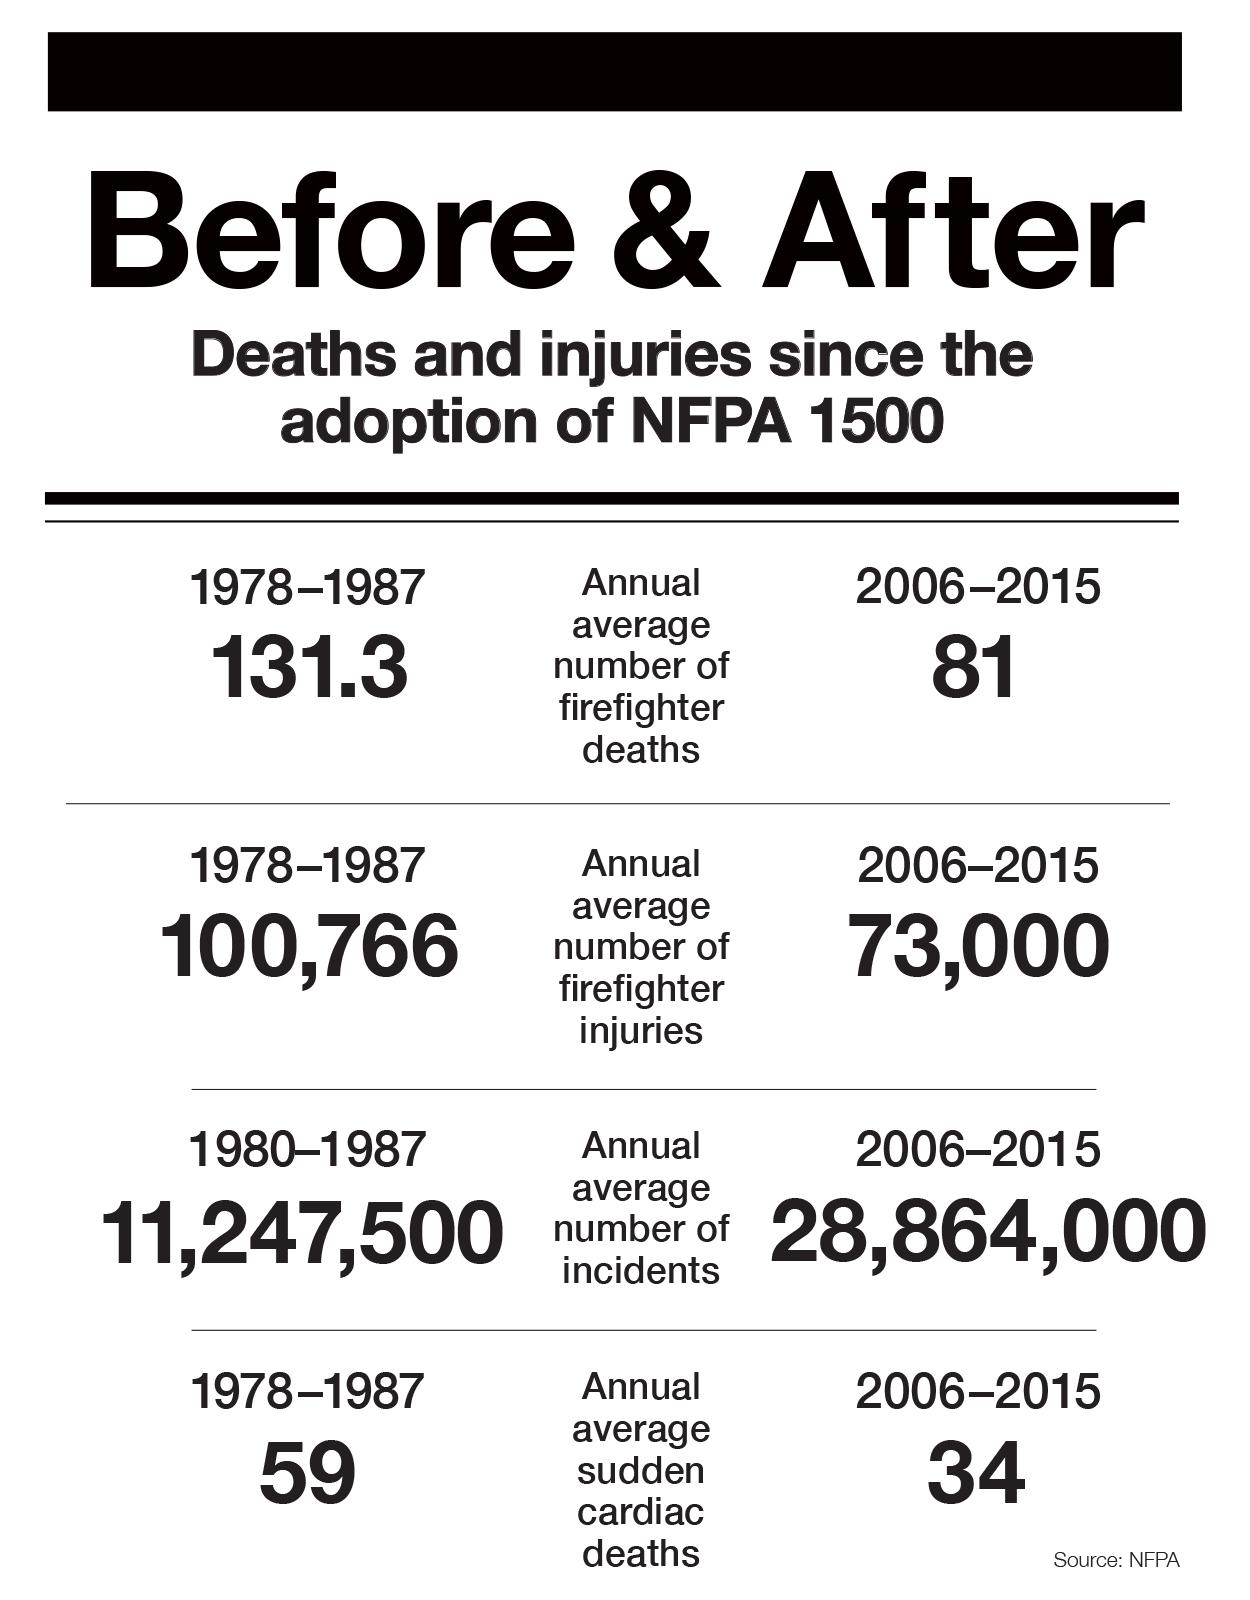 NFPA Journal - NFPA 1500, Jan Feb 2017